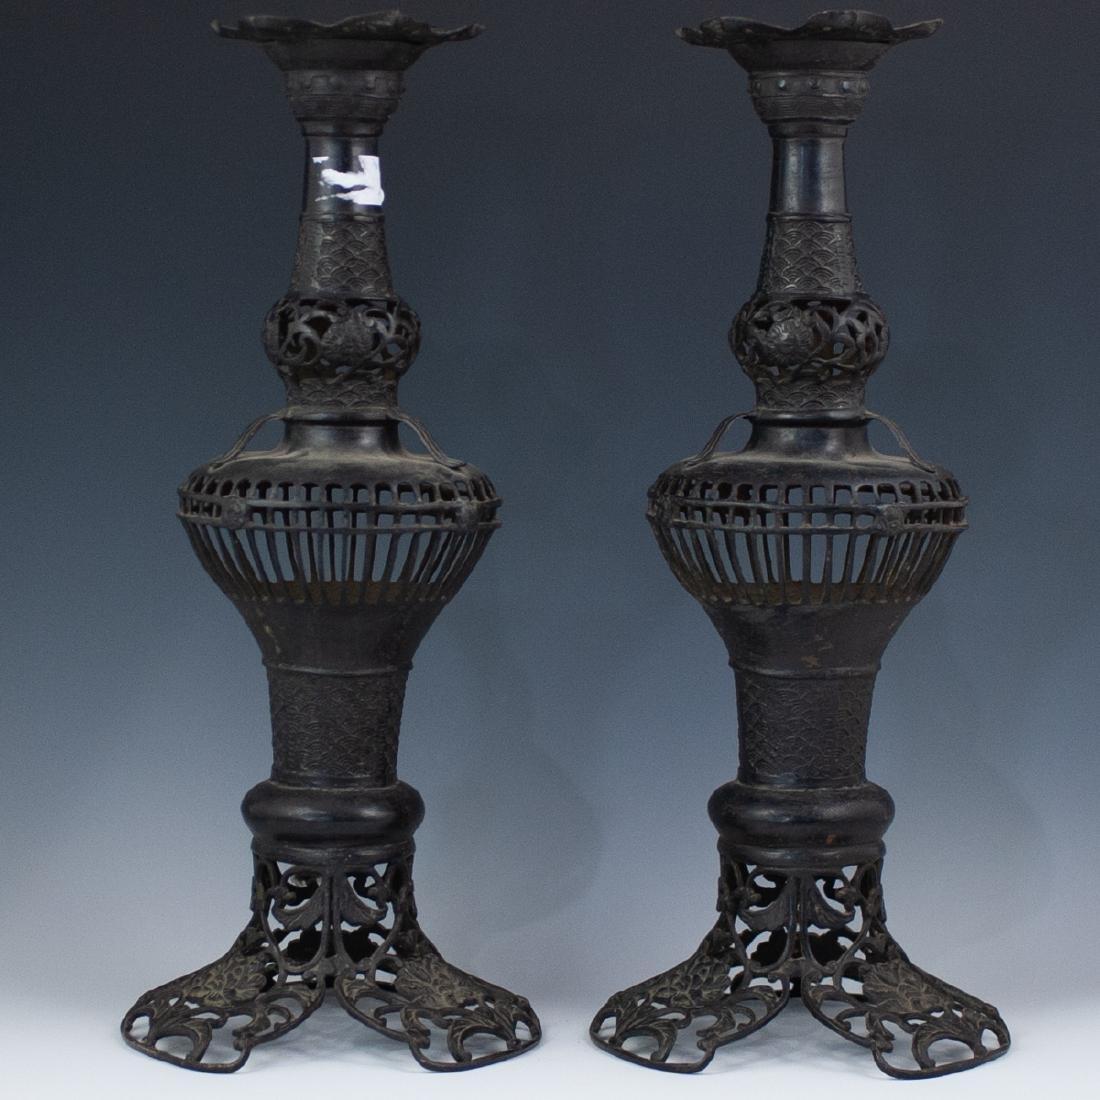 Japanese Bronze Altar Candlesticks